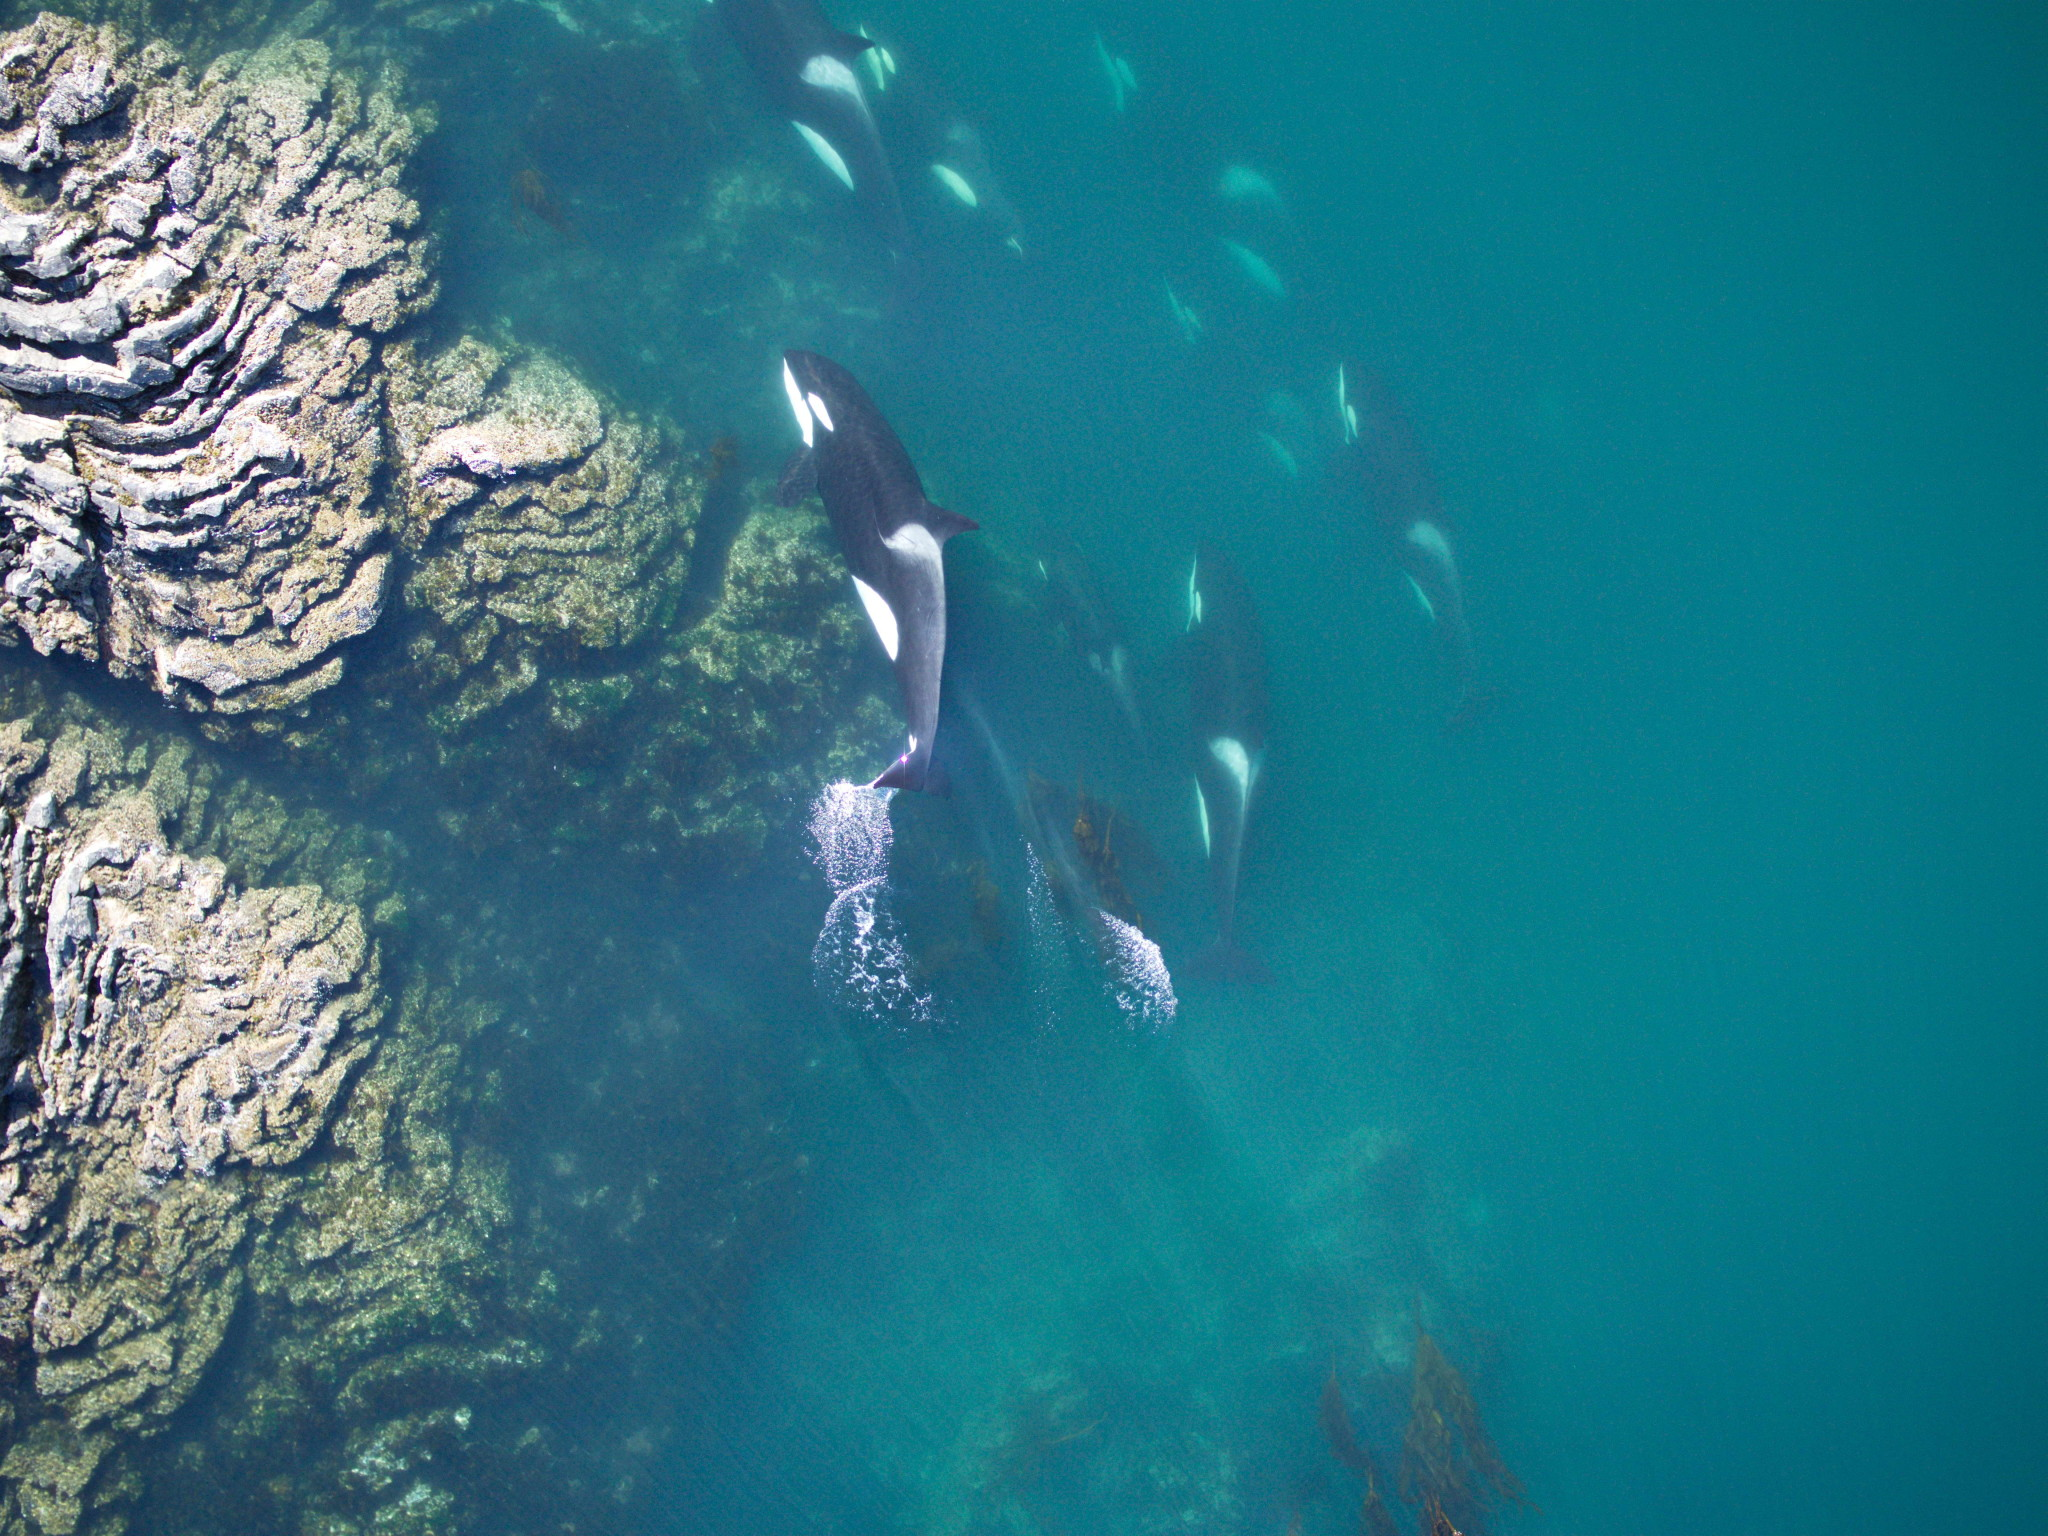 photo: NOAA/ Vancouver Aquarium